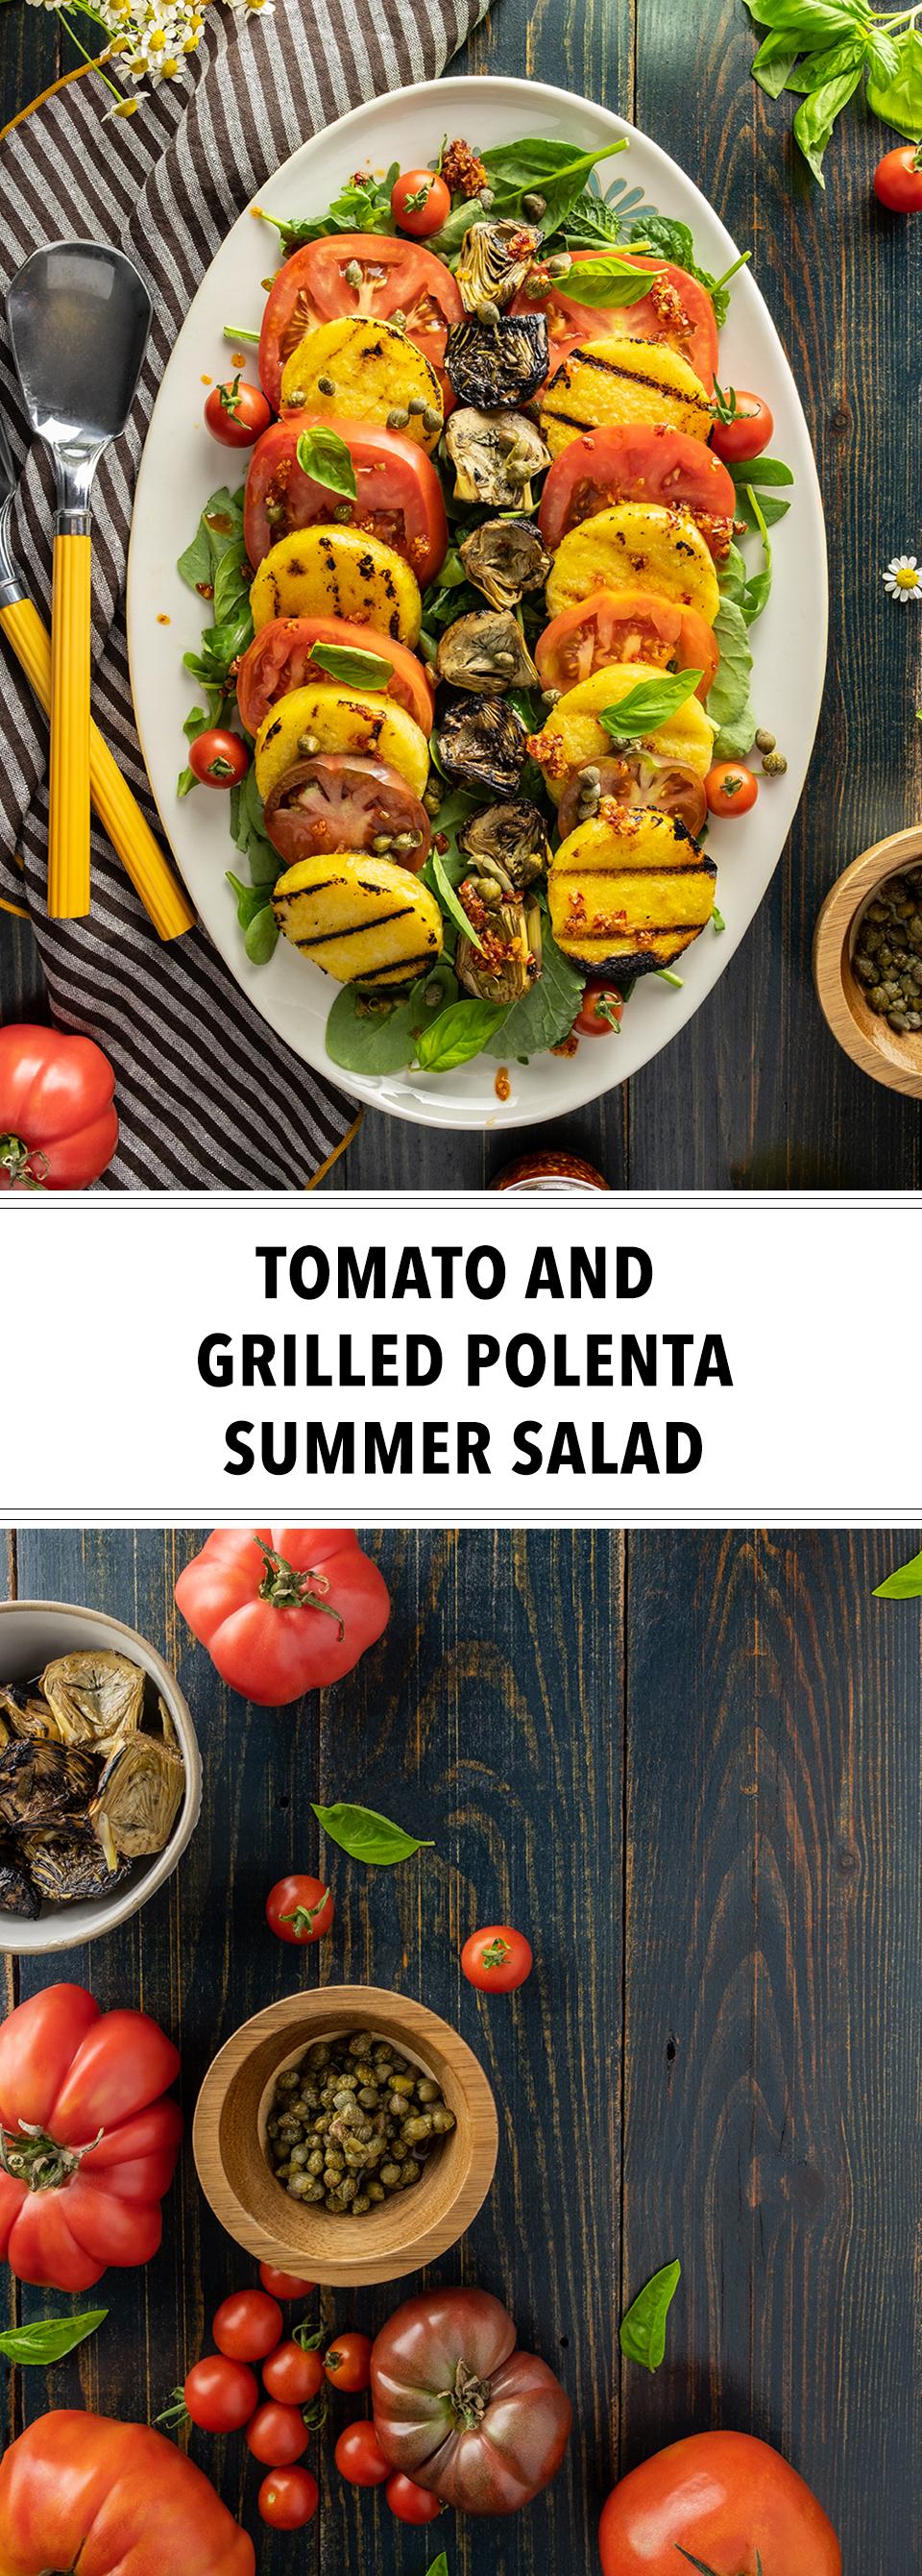 JodiLoves_Retouching_Brilliant_Pixel_Imaging-Tomato-and-Polenta-Summer-Salad.jpg